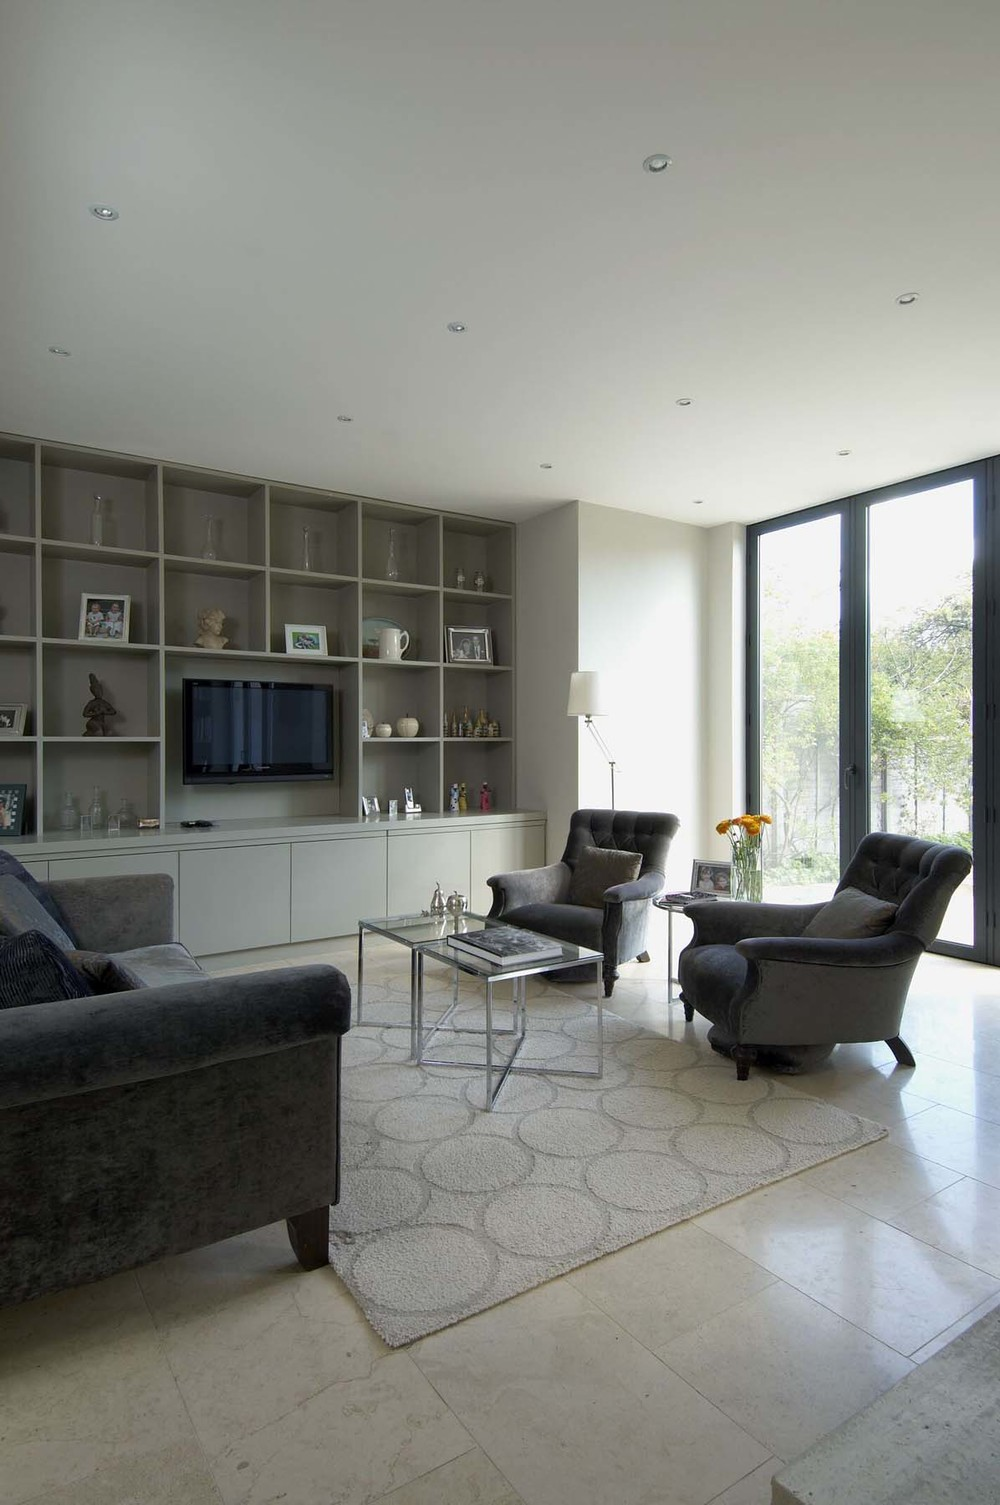 edwardian house interior design. 5  sitting room jpg Edwardian House Interior Design London Gabi Da Rocha Interiors